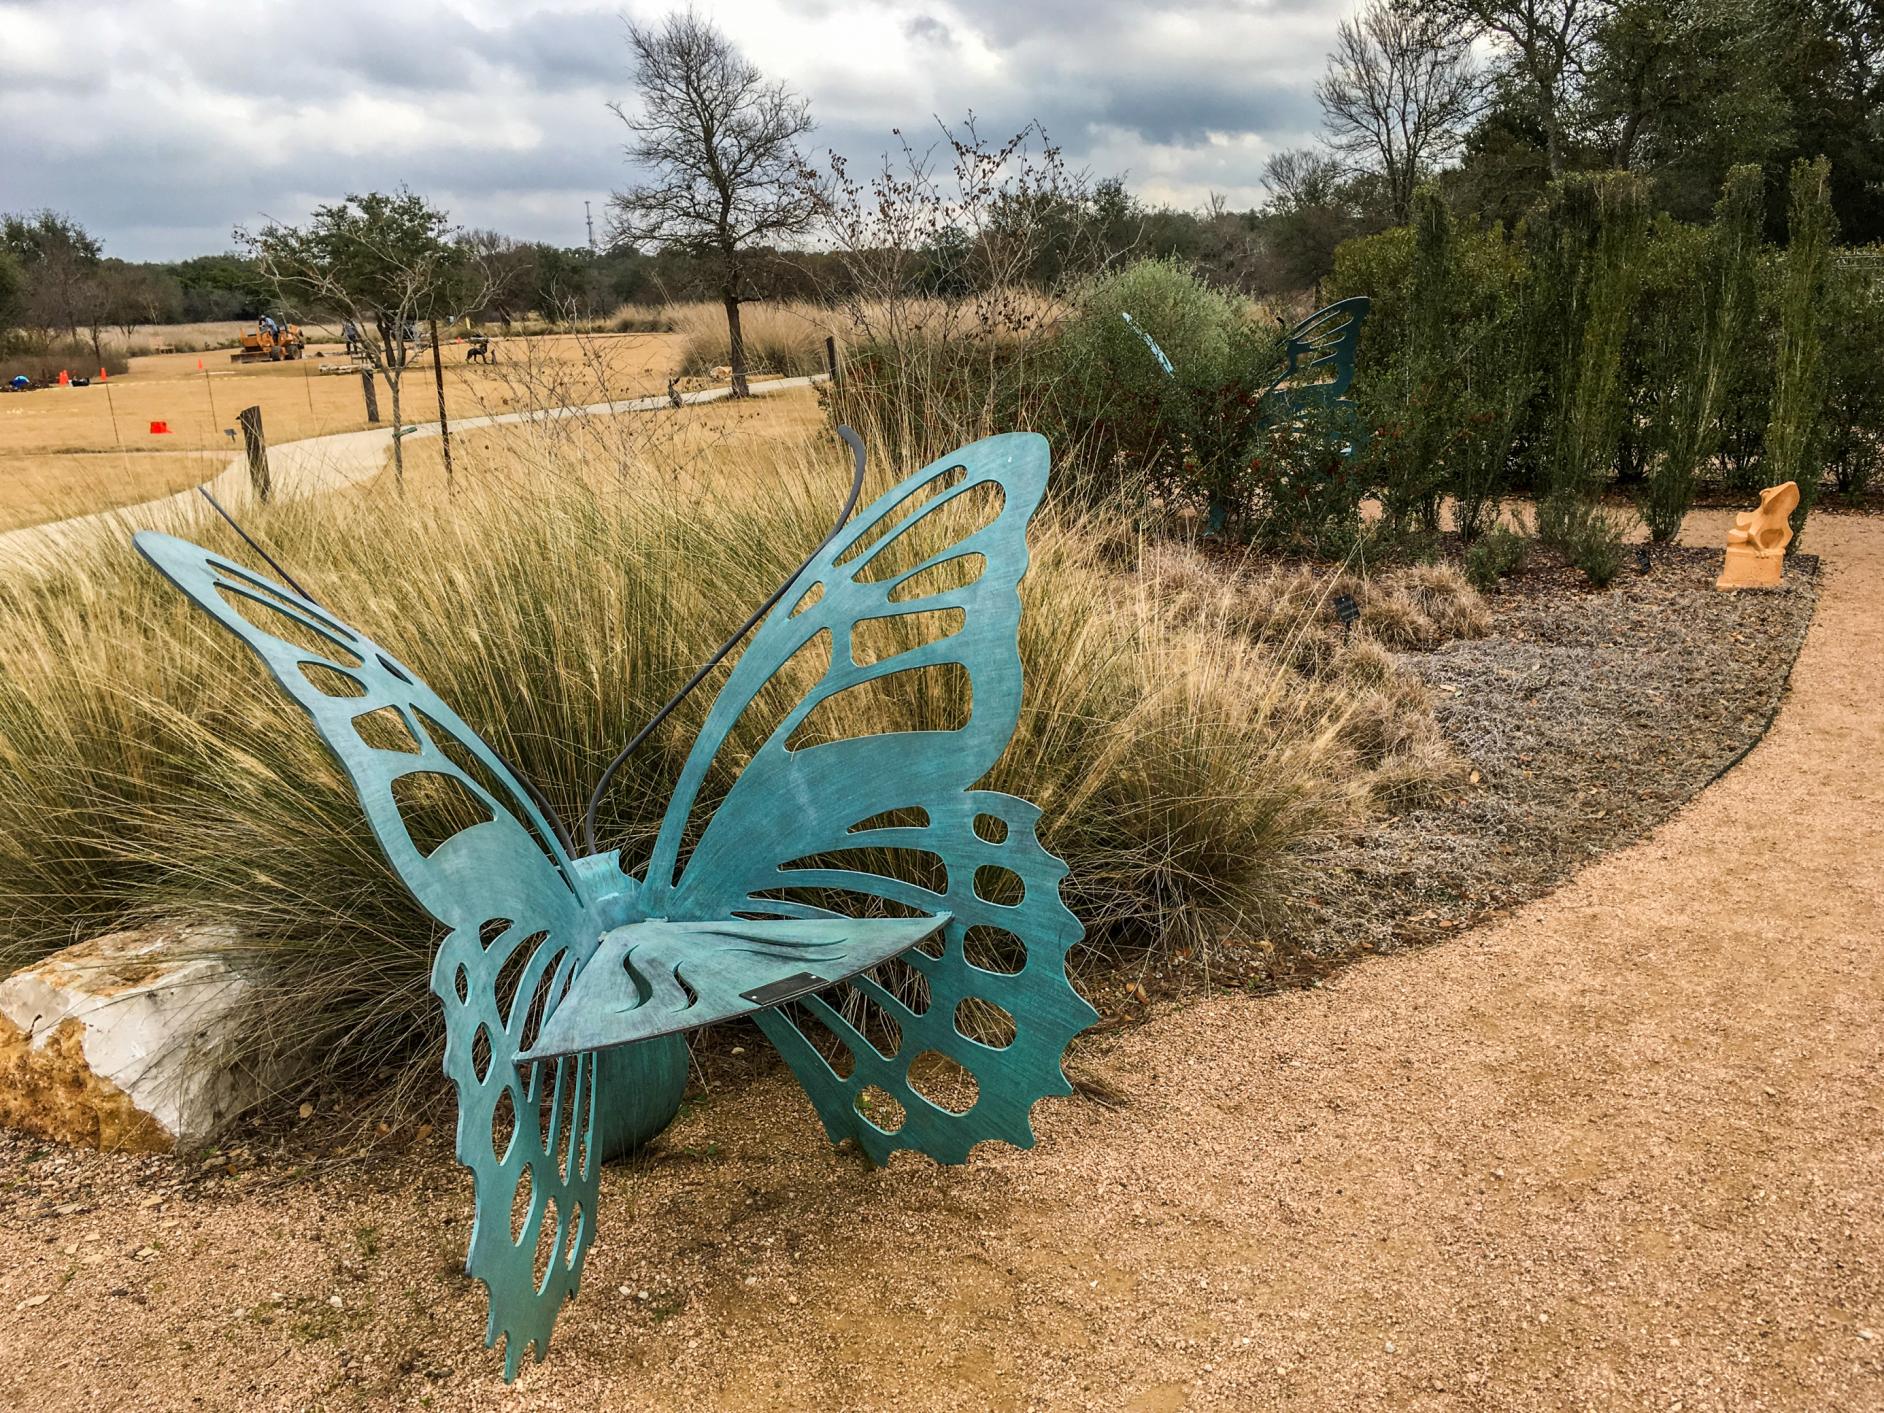 Lady Bird Johnson Wildflower Center - Lonely Planet